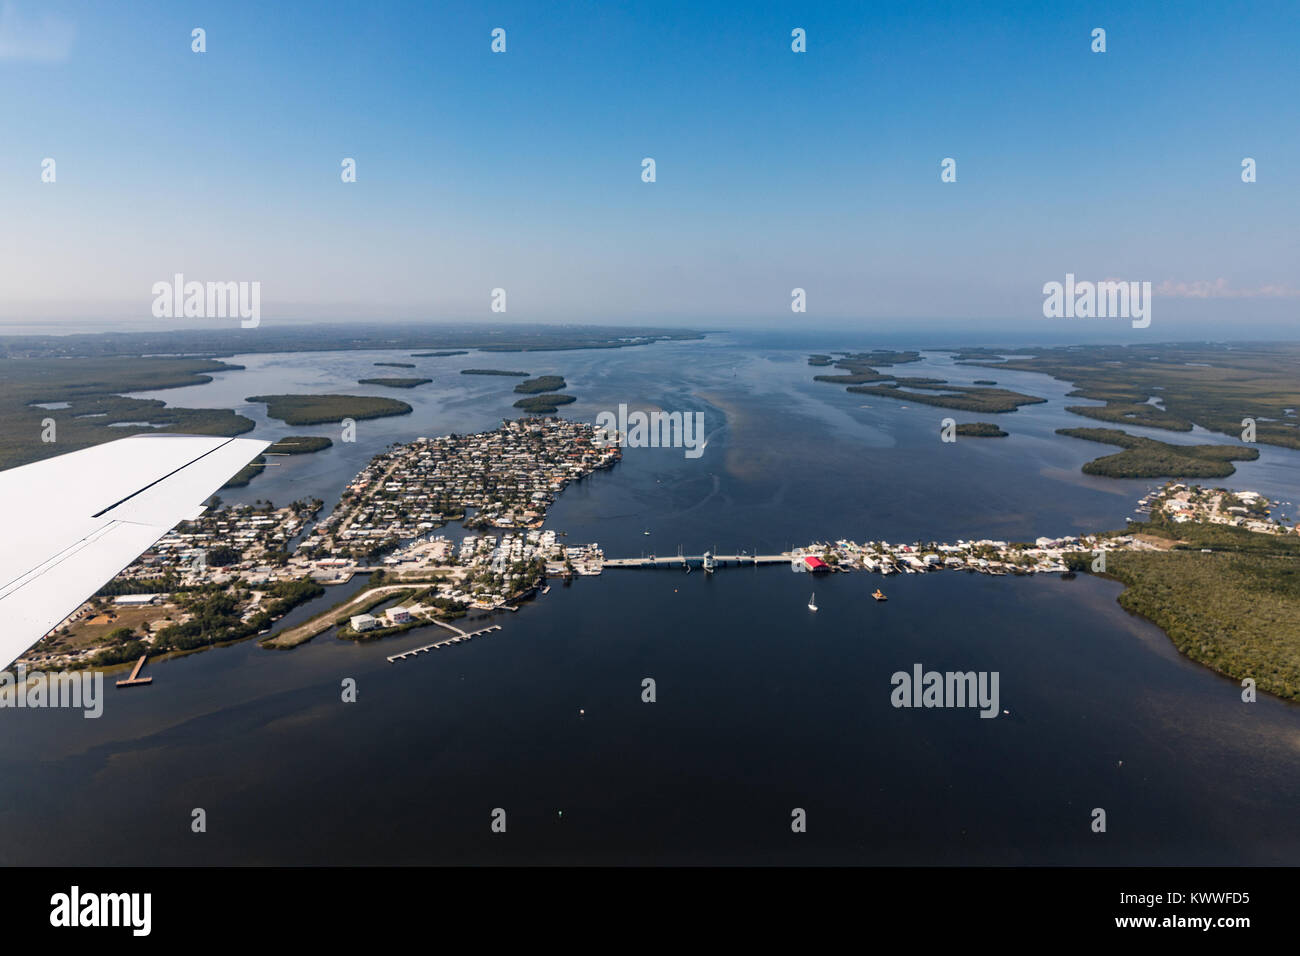 Fort Lauderdale Aerial Stock Photos Amp Fort Lauderdale